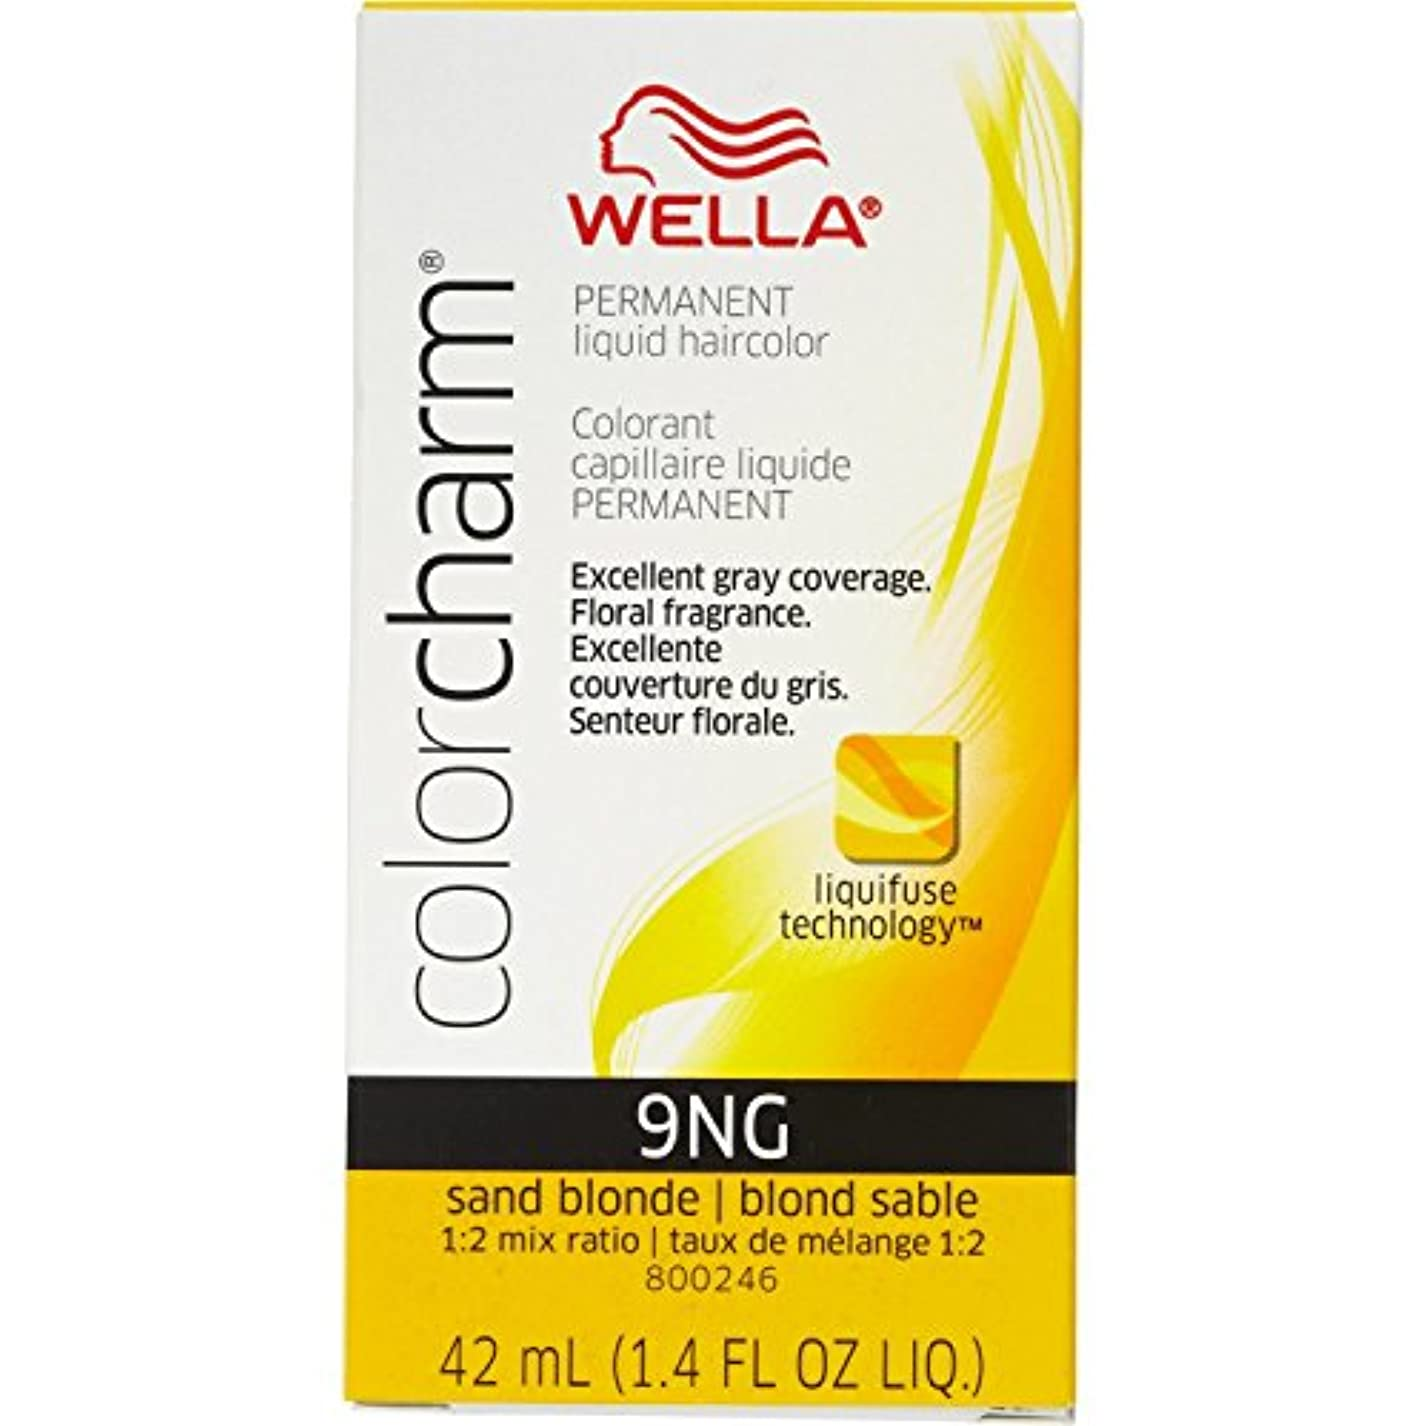 Wella 砂のブロンド色のチャーム液体パーマネントヘアカラー